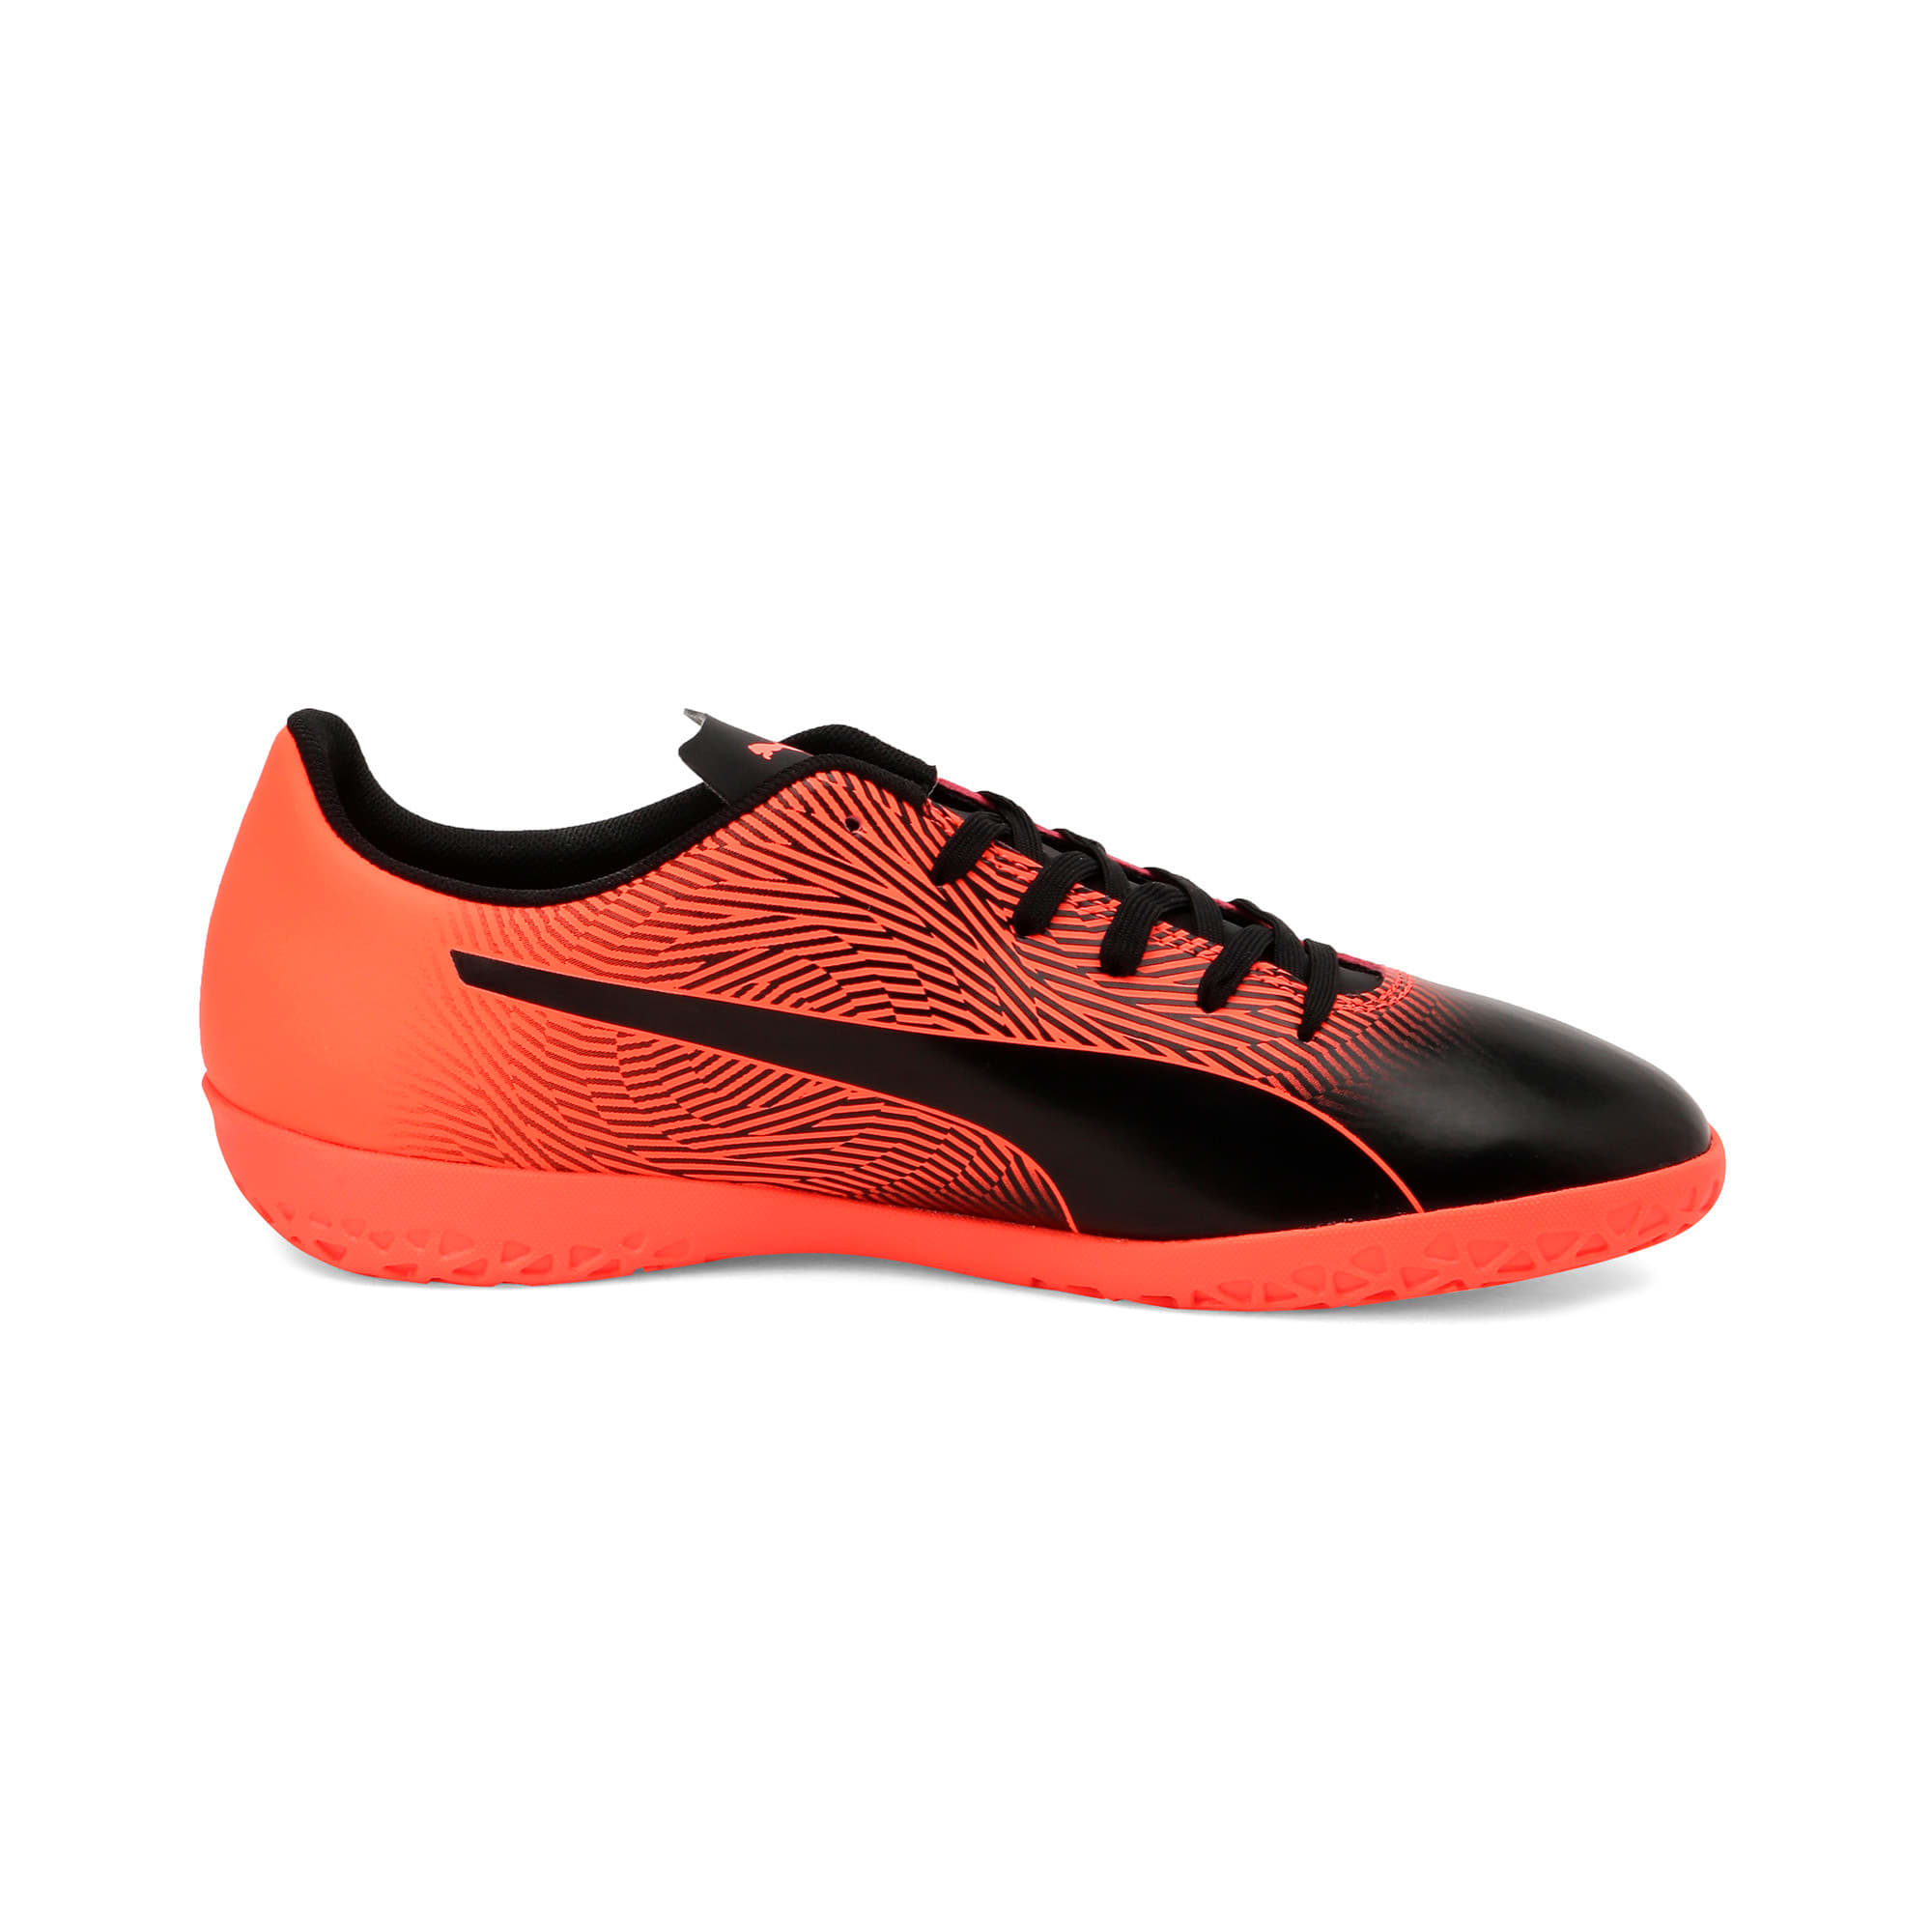 Thumbnail 6 of PUMA Spirit II IT Men's Football Boots, Puma Black-Nrgy Red, medium-IND